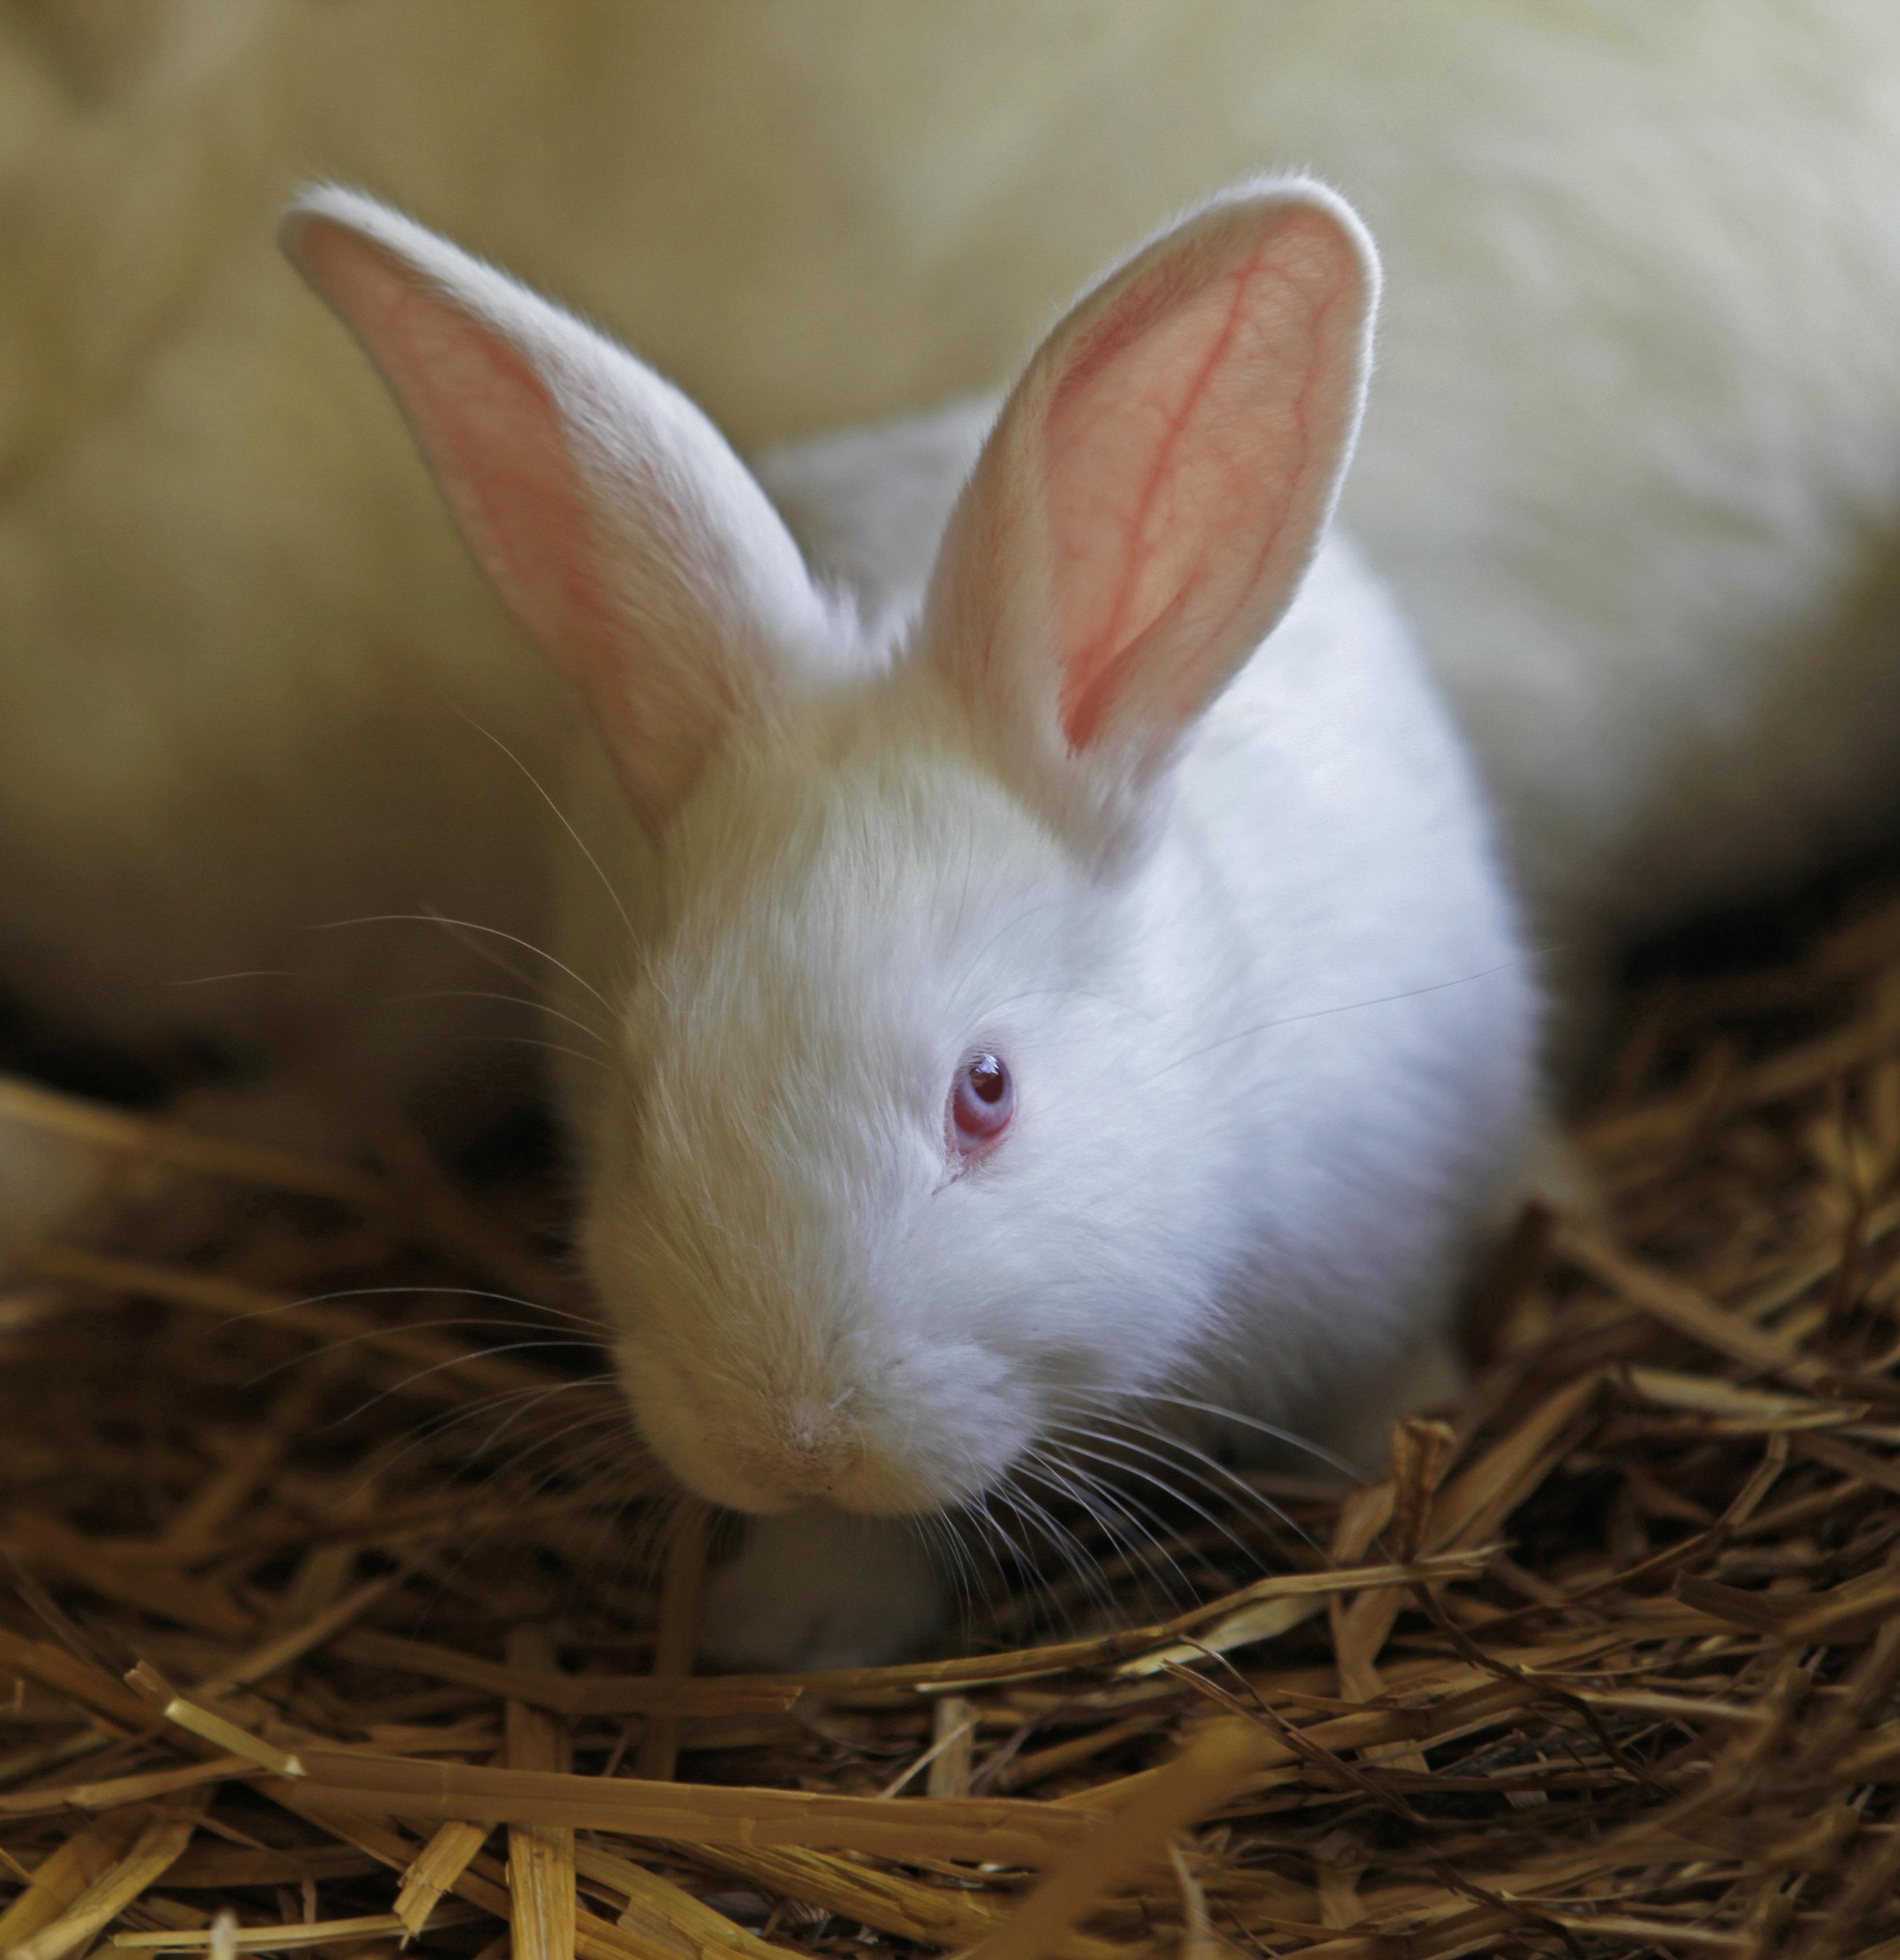 A small white rabbit